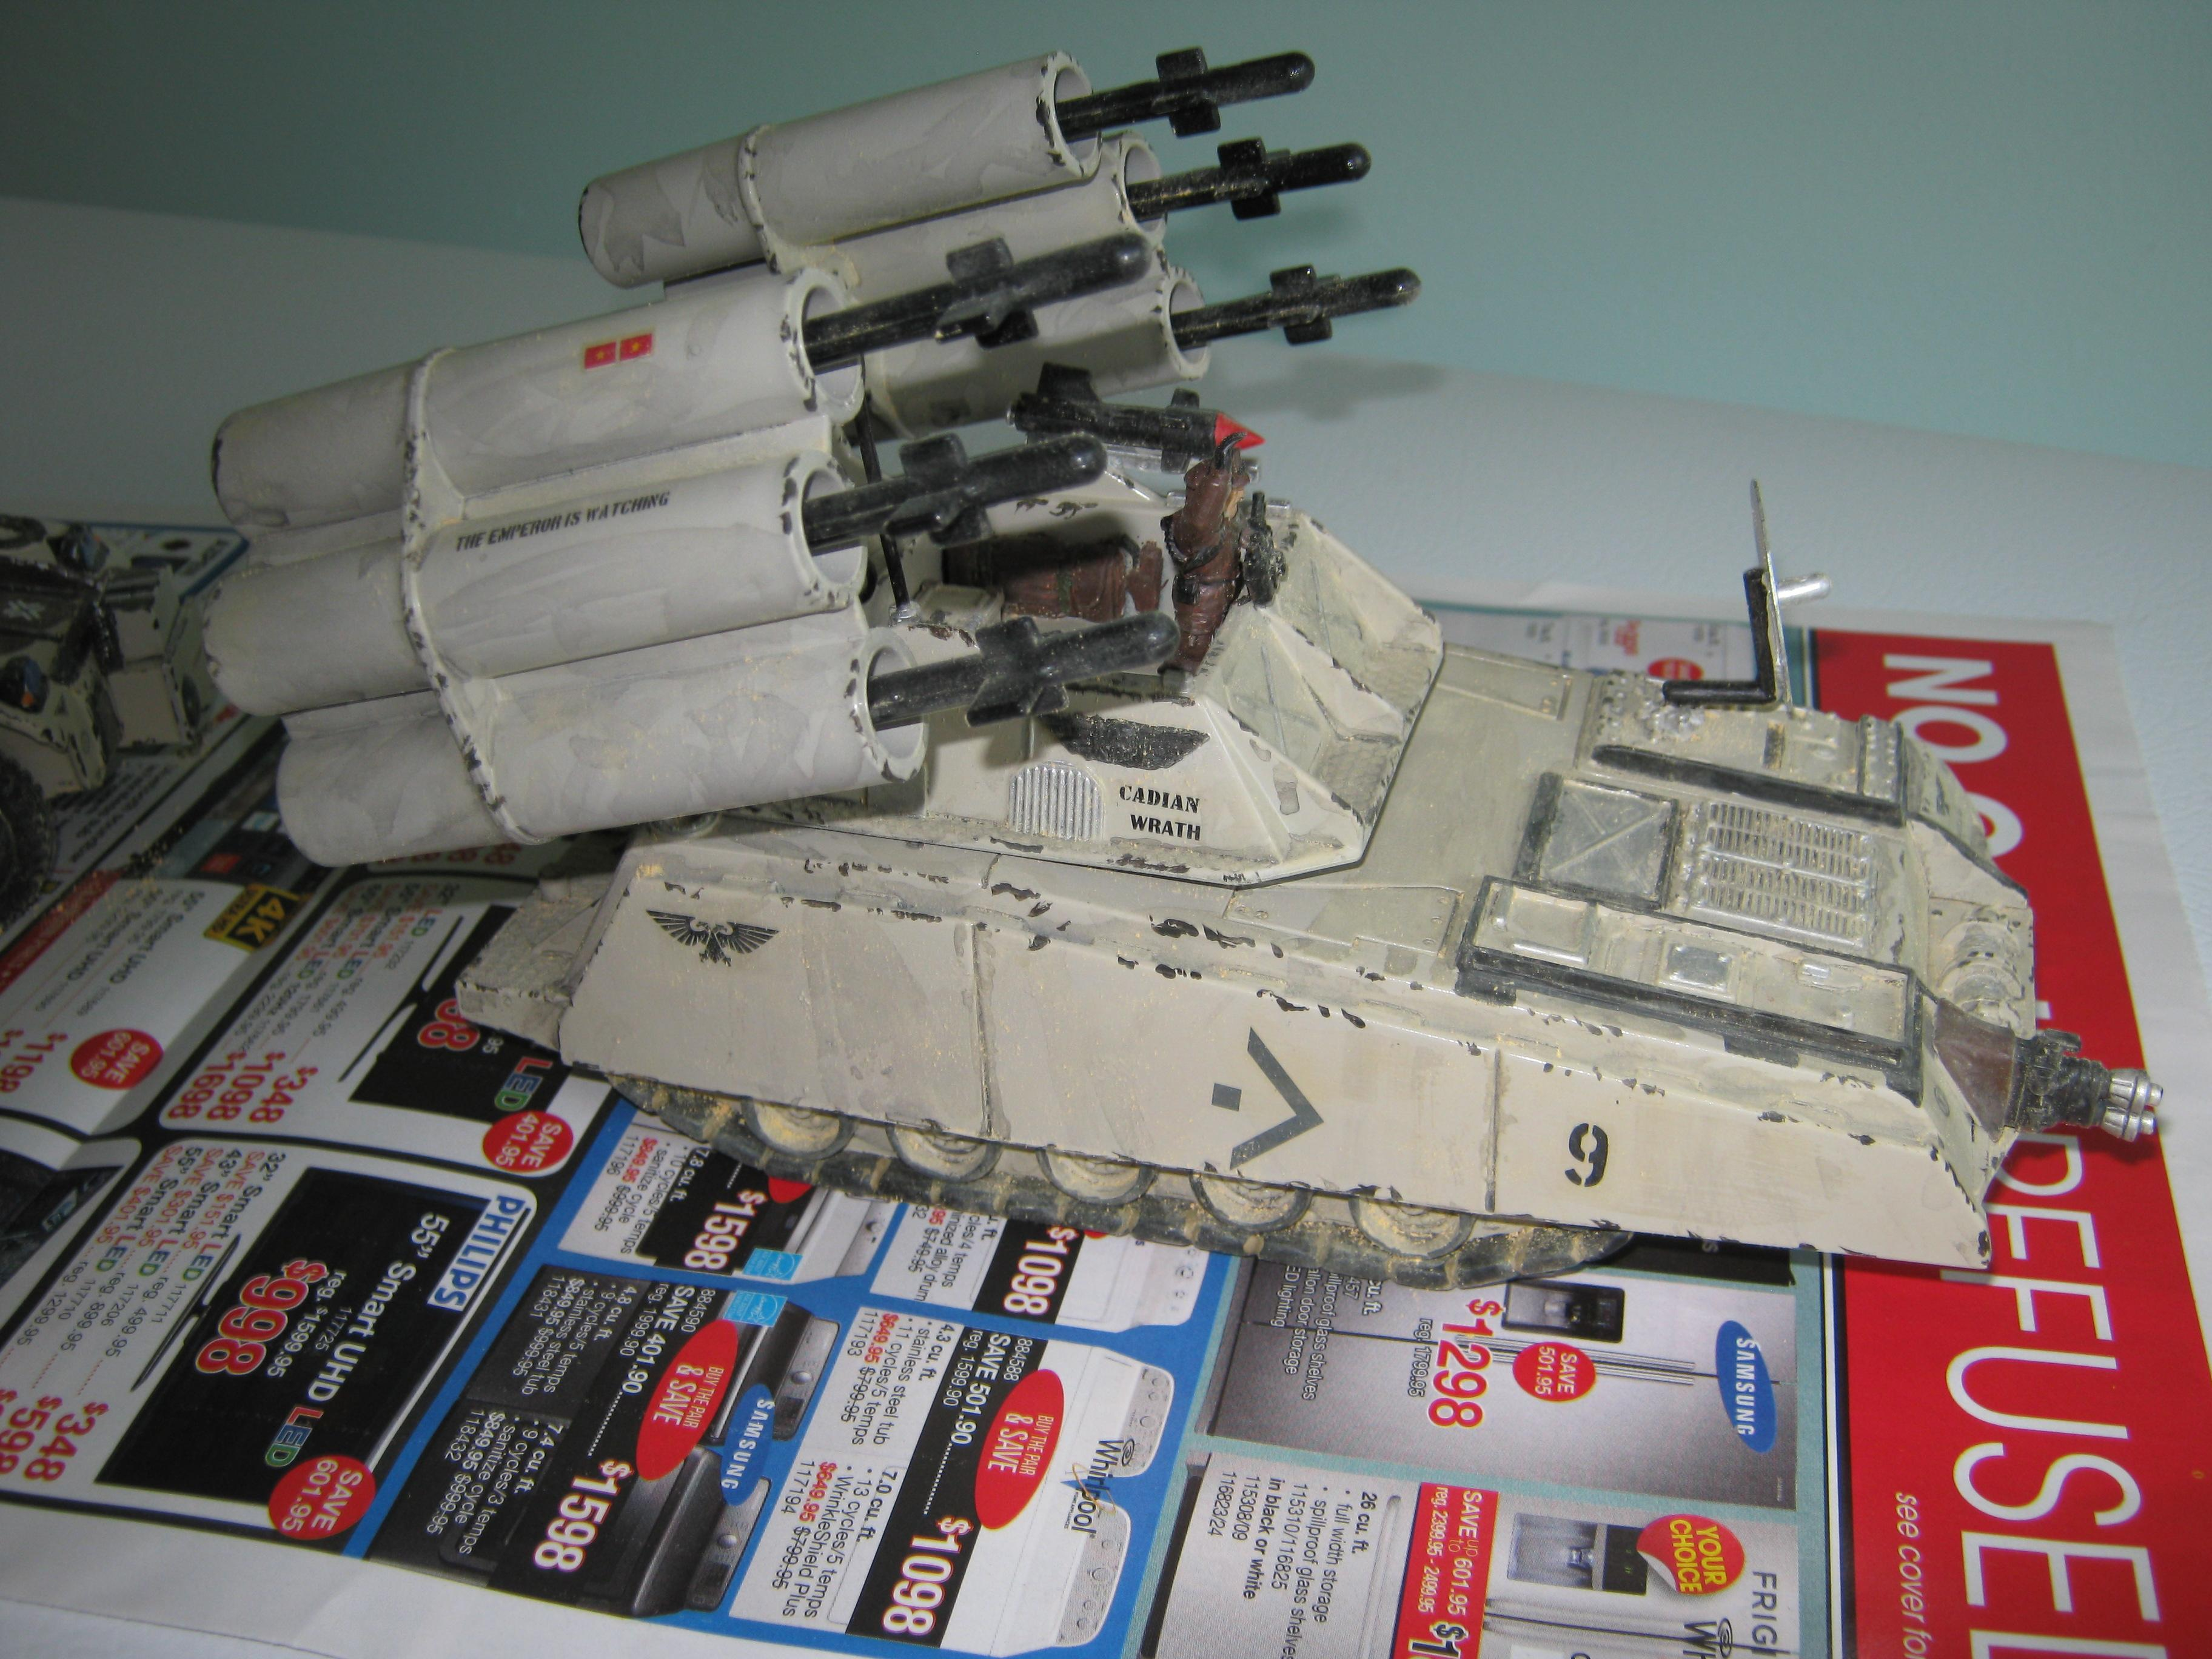 Adv, Air Defense Vehicle, Anti-aircraft, Armadillo, Artillery, Conversion, G.i. Joe, Imperial, Mobile Sam System, Self-propelled, Tank, Toy